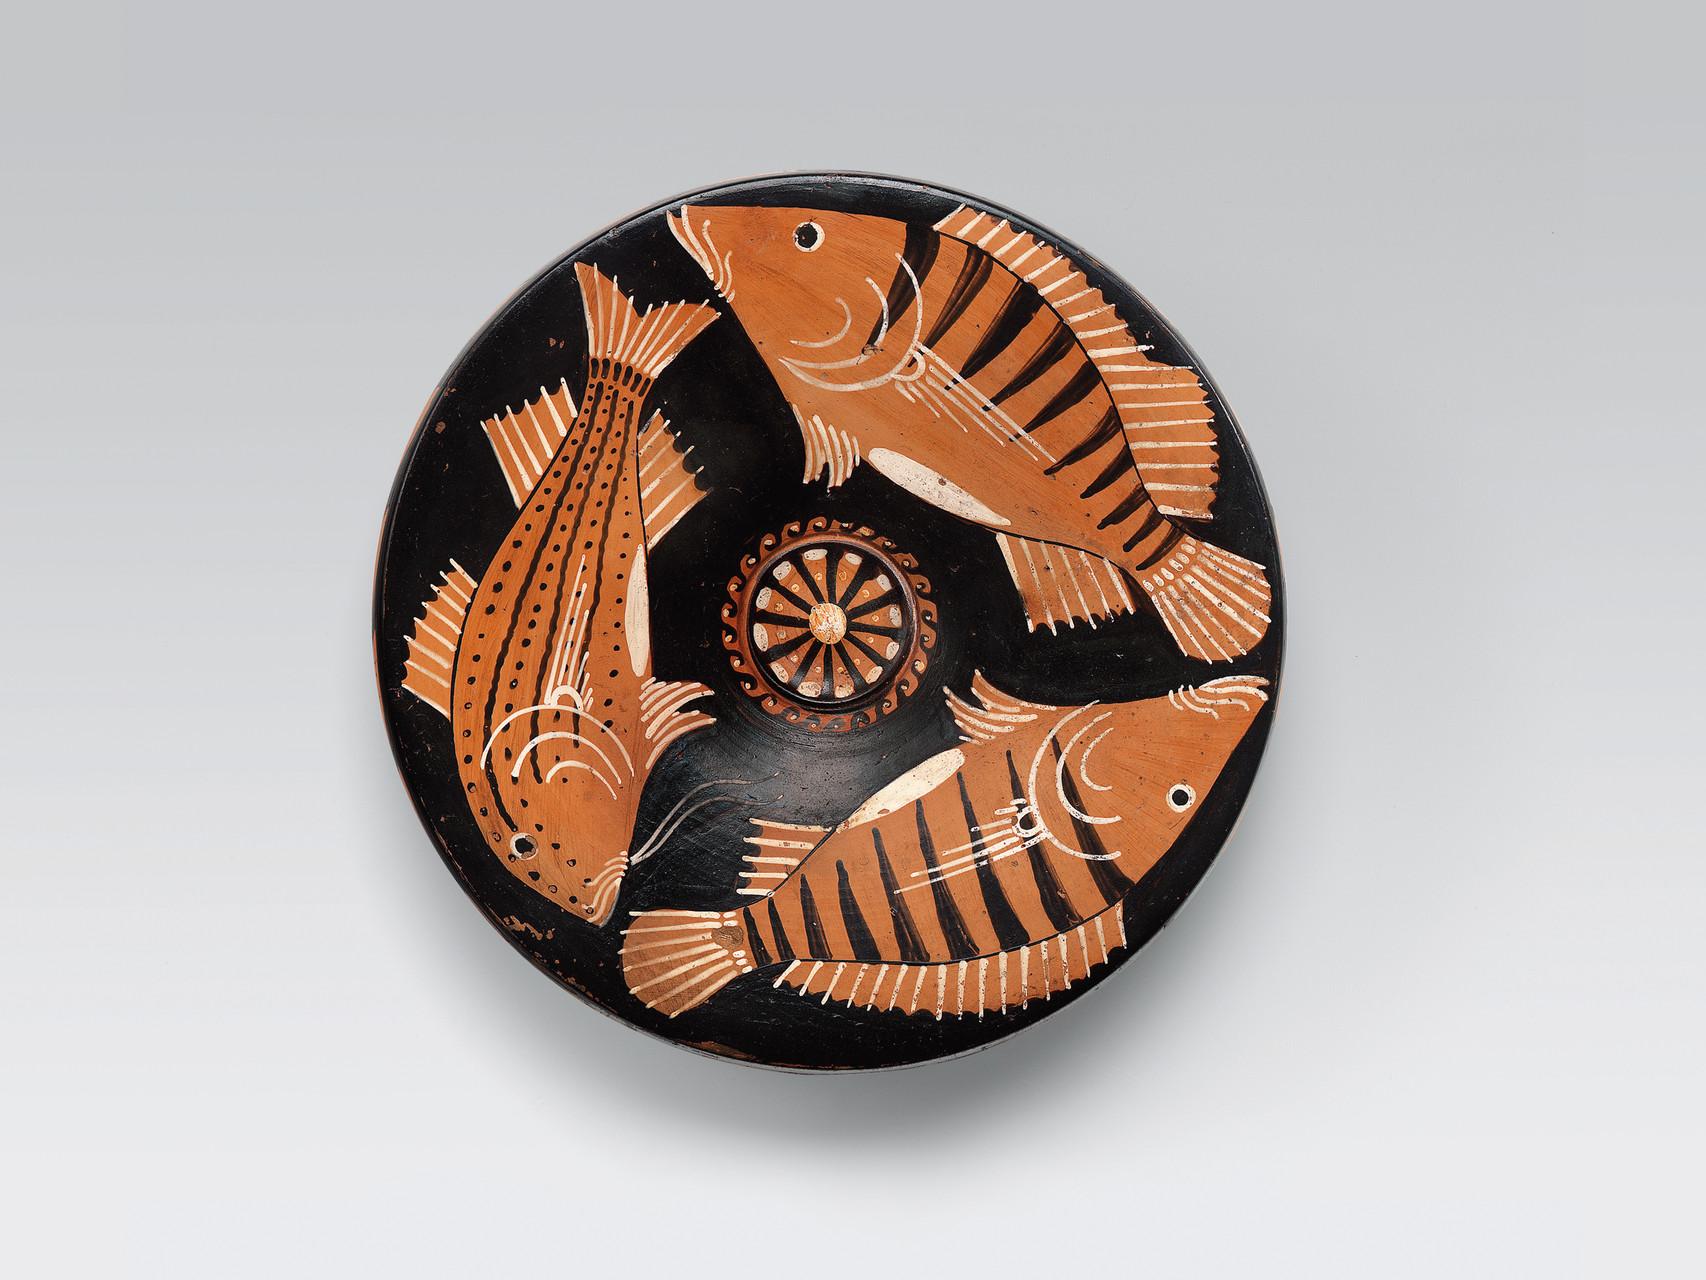 Piatto da pesce Ceramica apula a figure rosse, 330-310 a.C. da Ruvo Collezione Intesa Sanpaolo